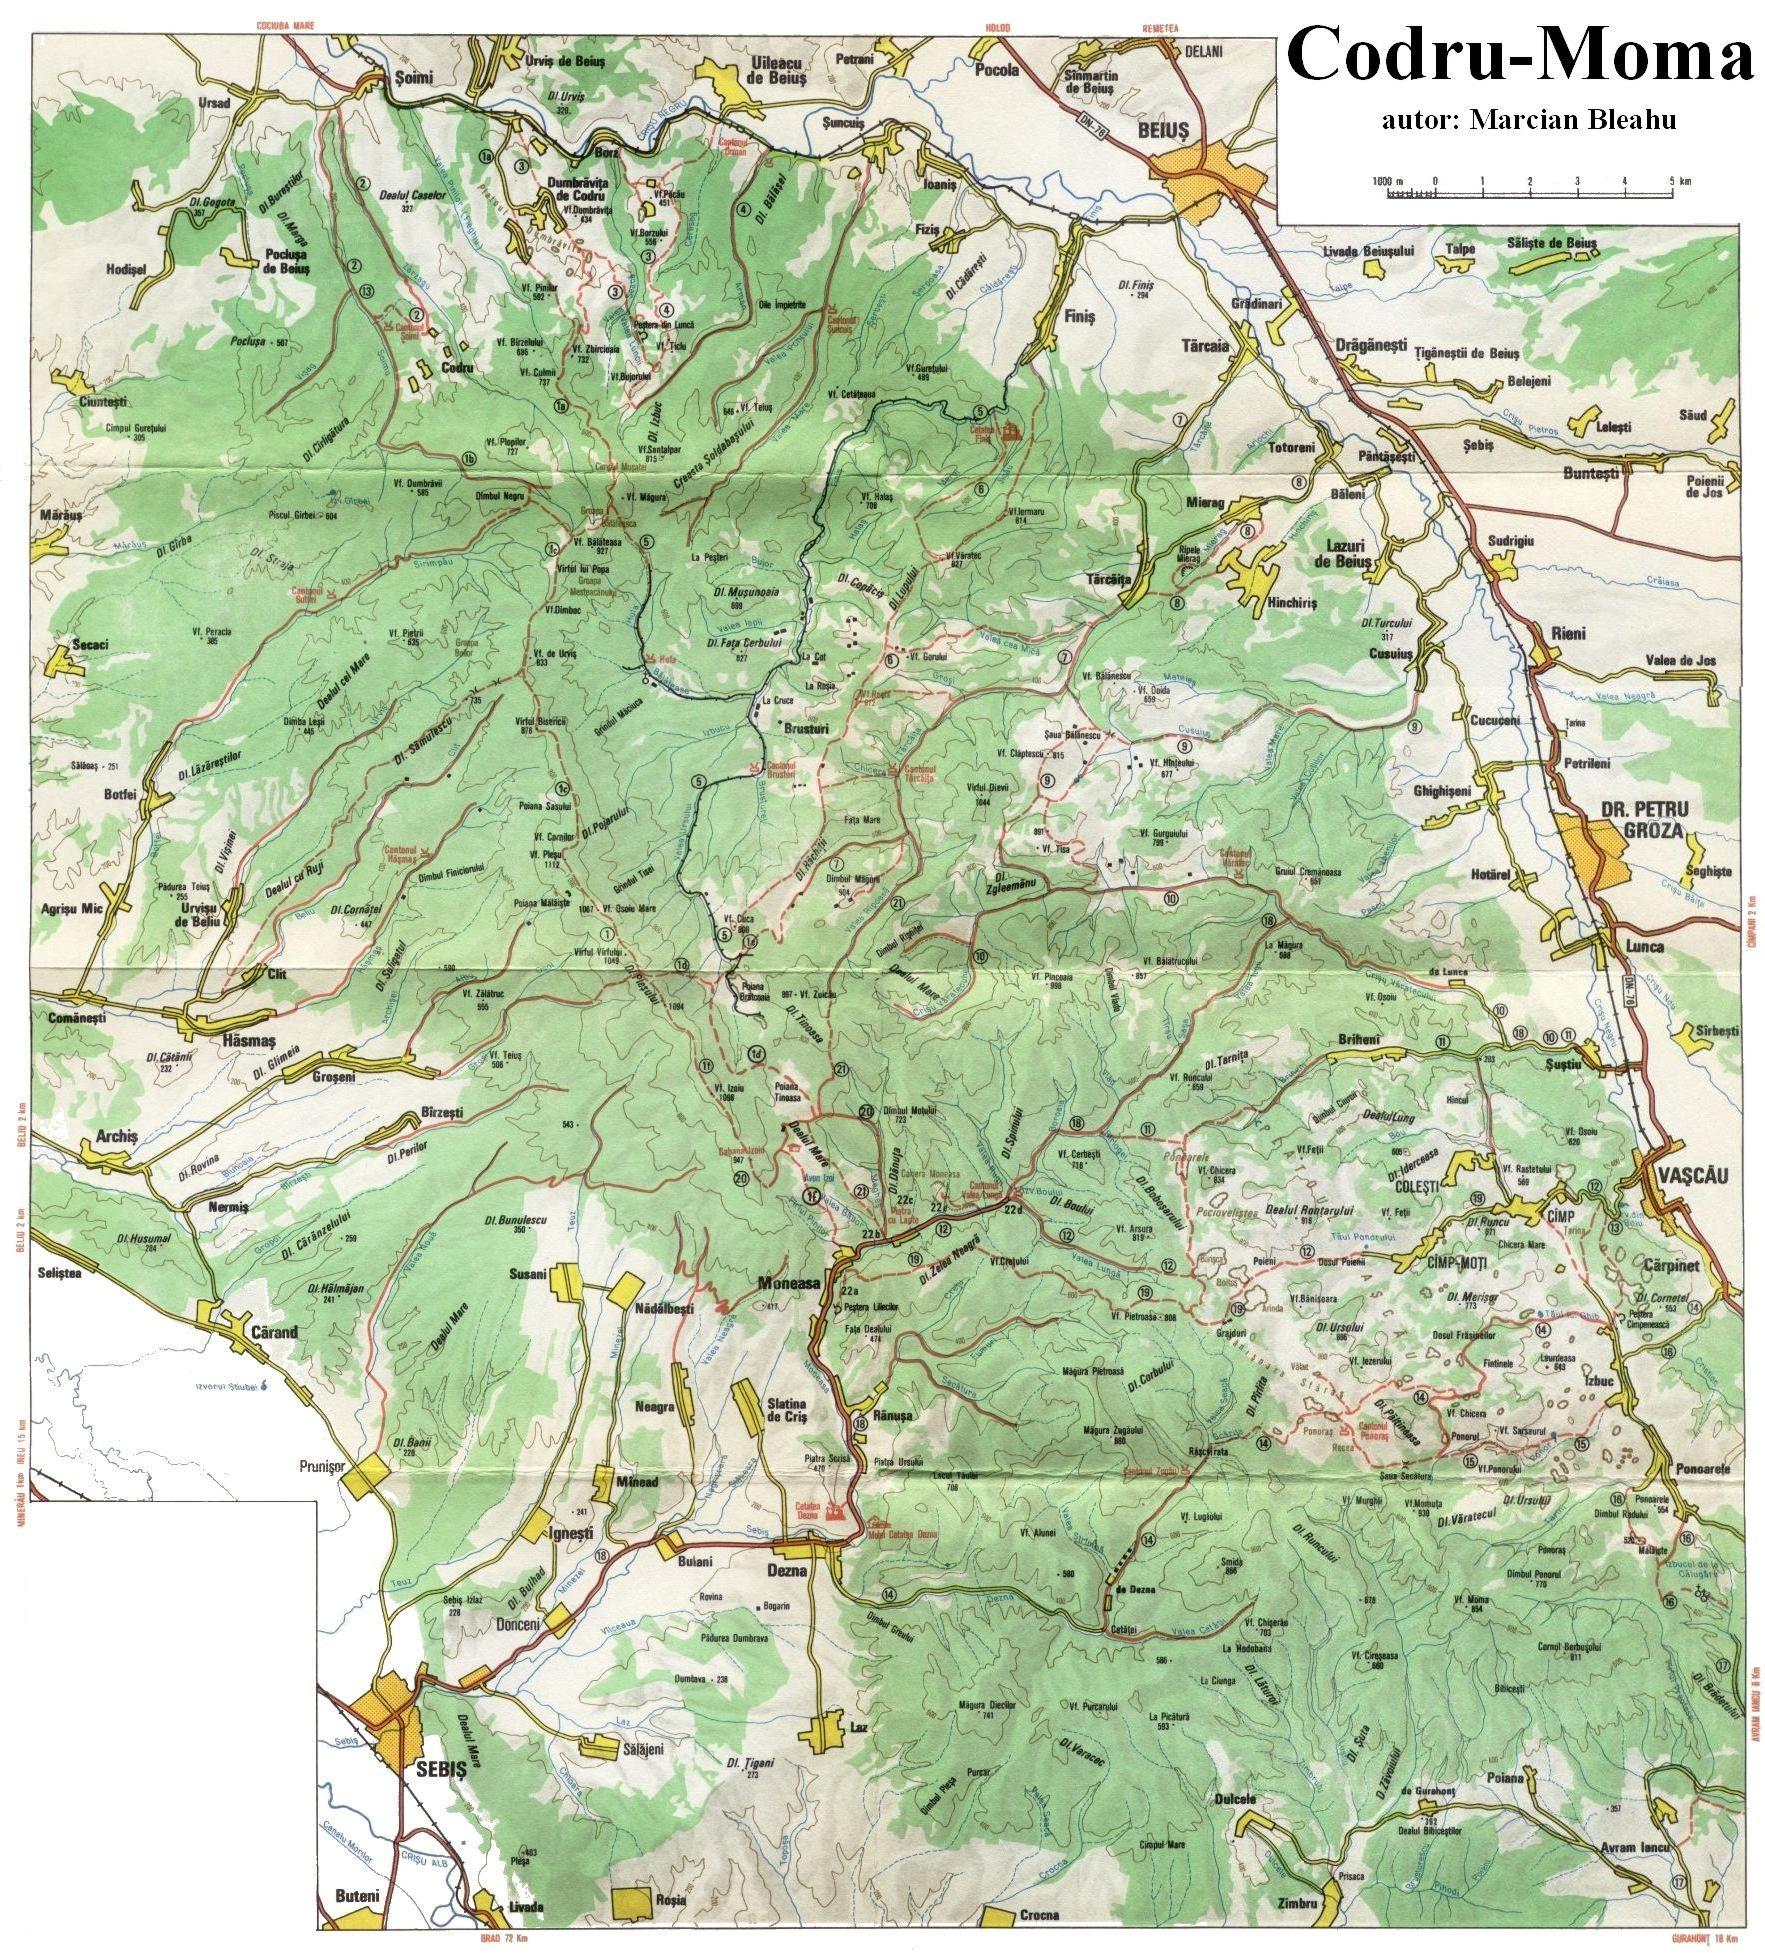 Harta Muntilor Codru Moma 2 Profu De Geogra